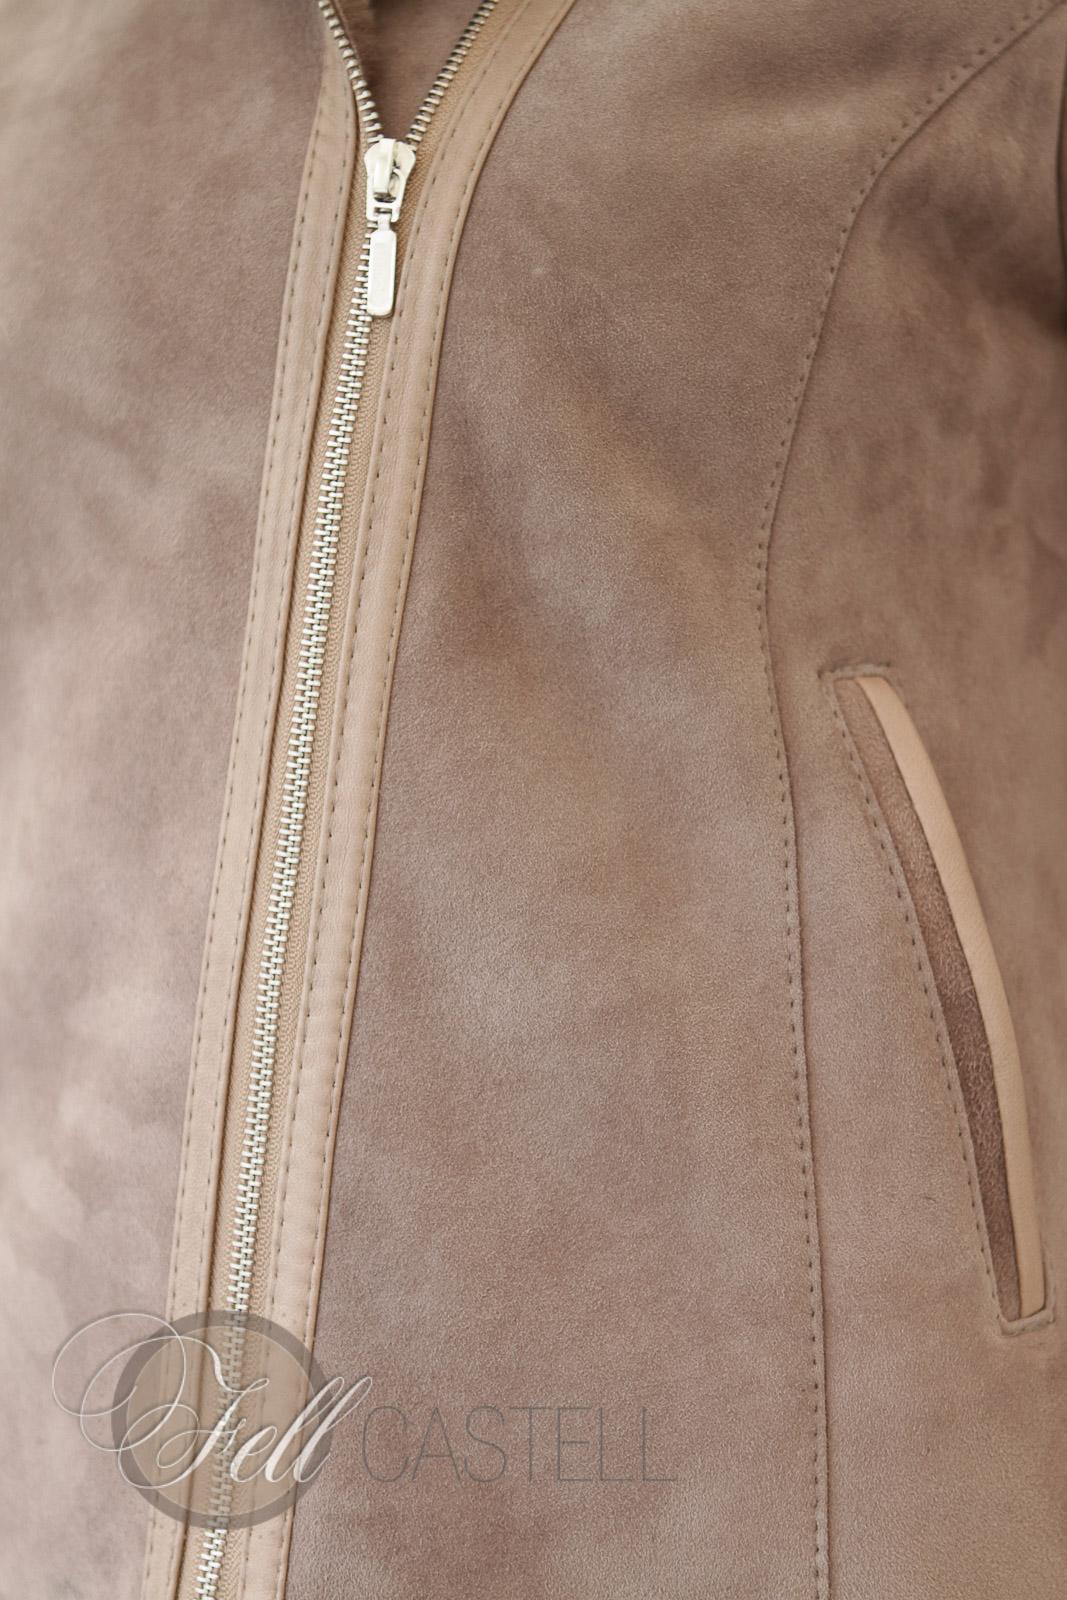 Lammfelljacke Damen Velourleder Beige Fell Braun kurz geschoren Kapuzenjacke mit Reißverschluss 38 / M 38 / M